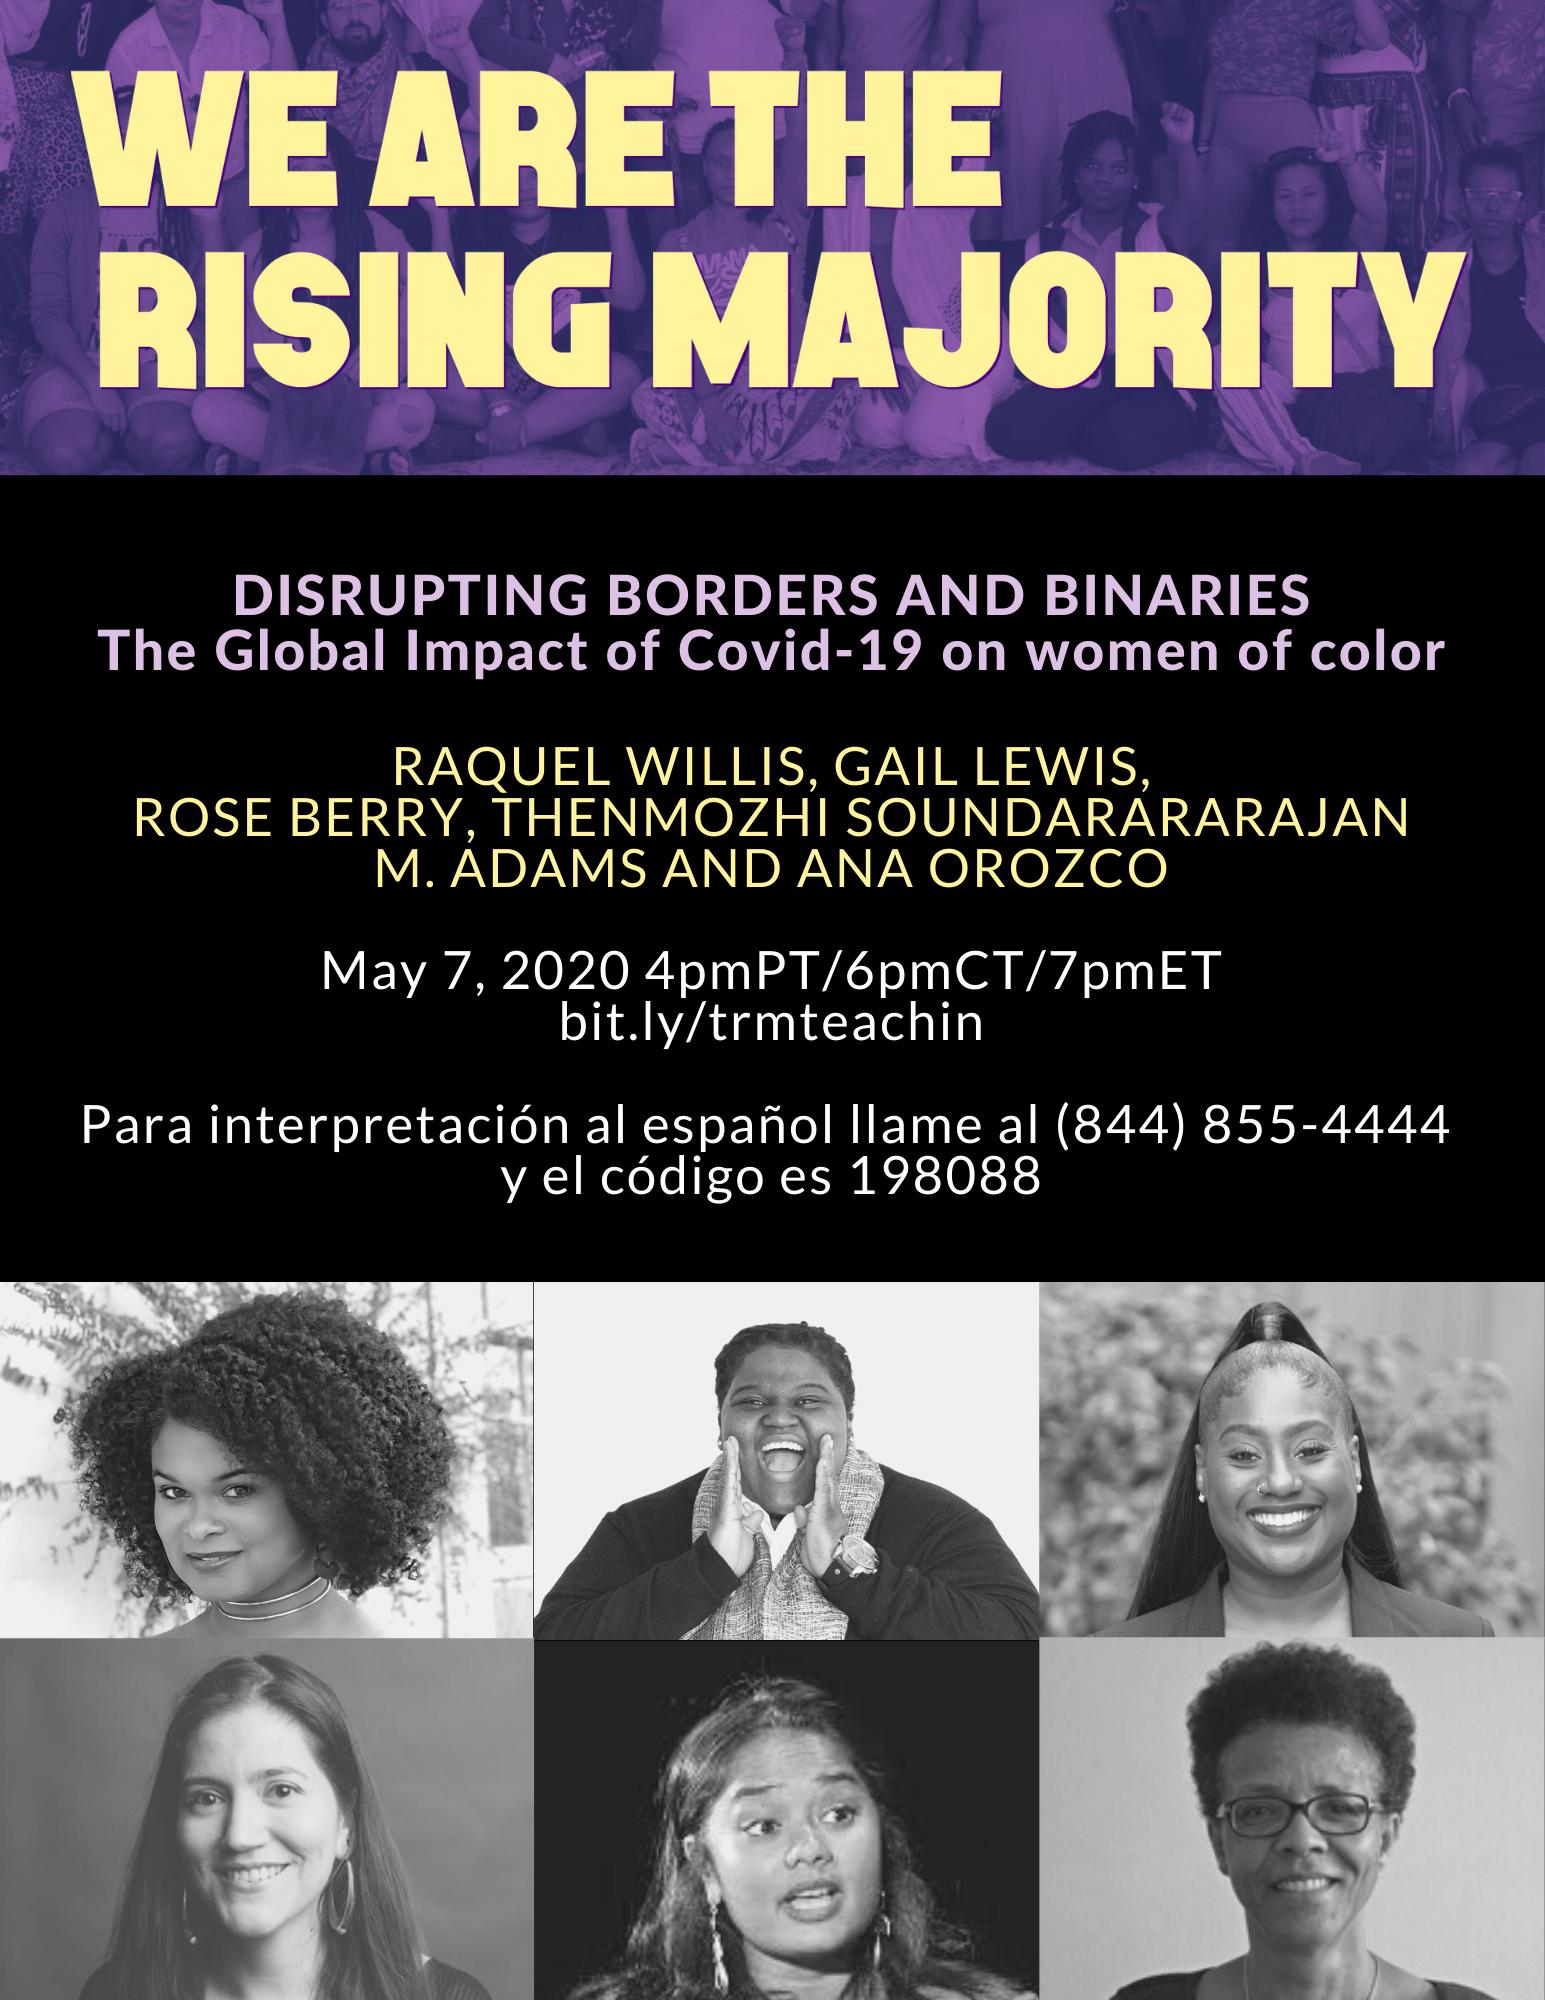 Disrupting Borders & Binaries flyer image